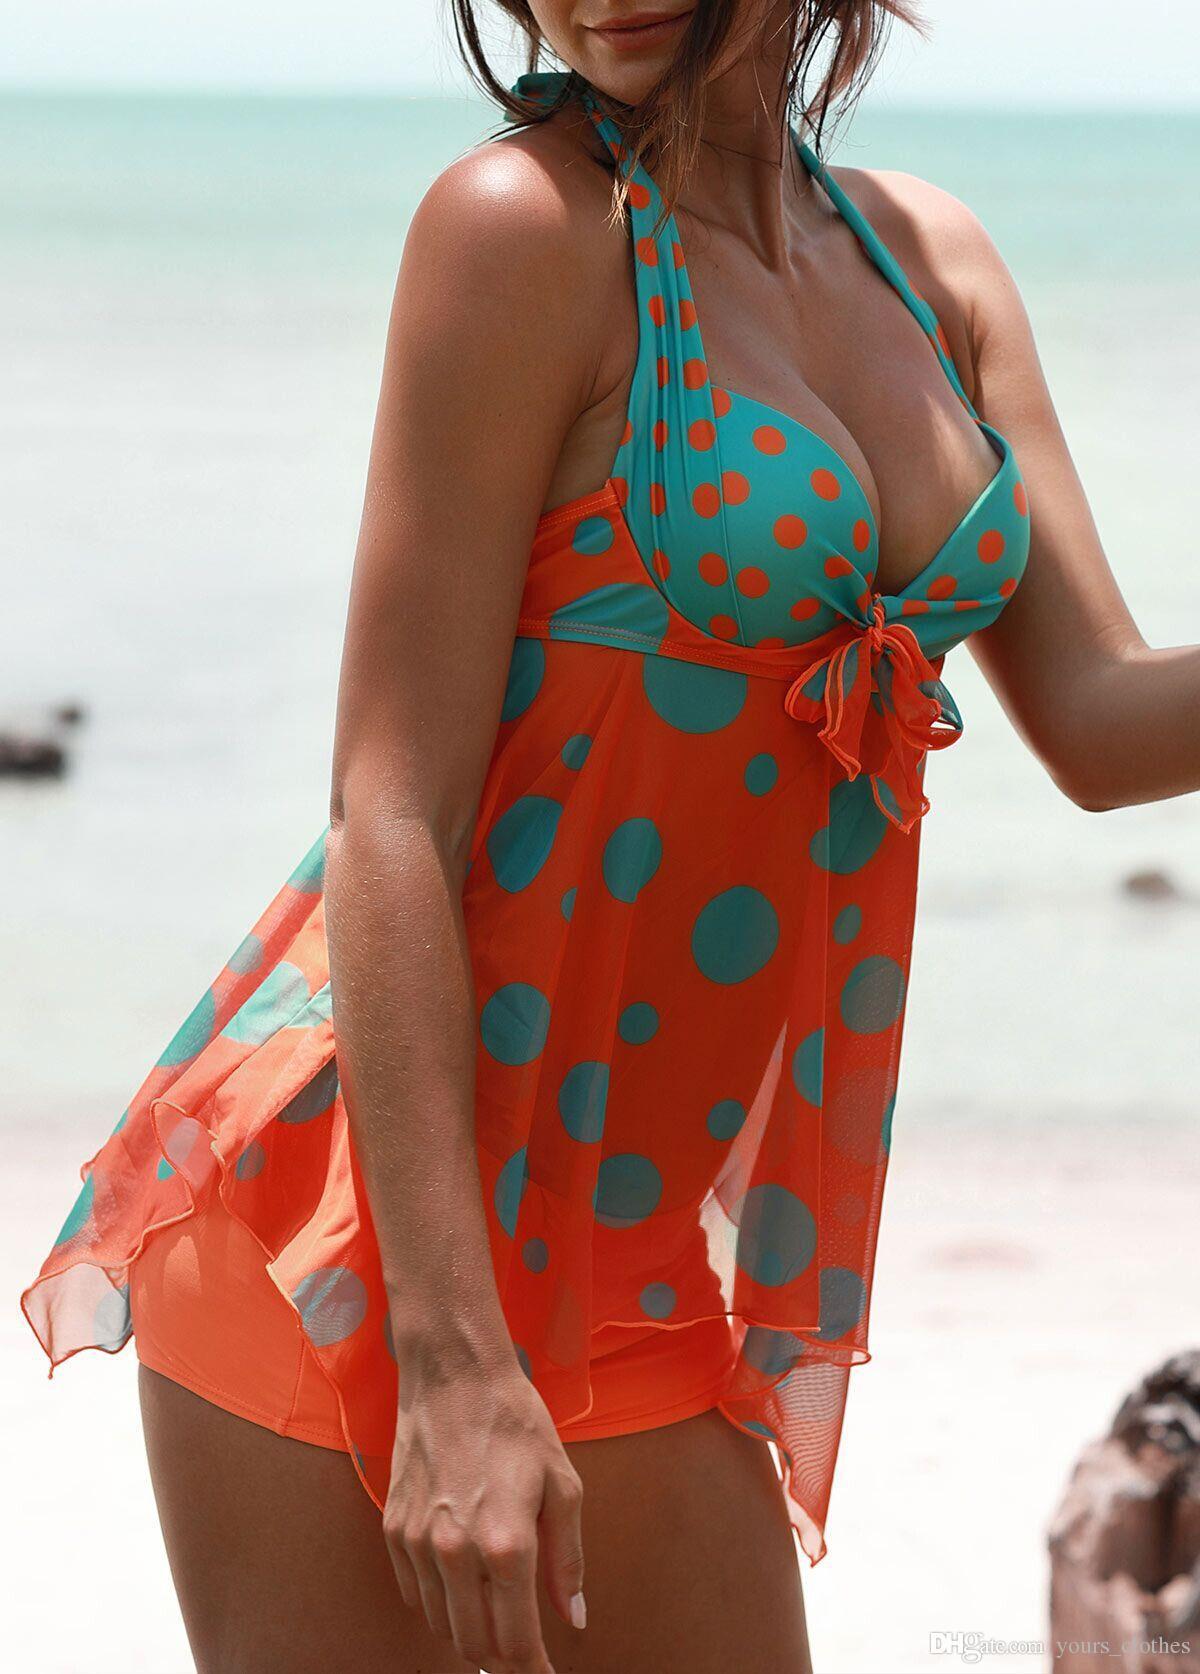 2018 New Bikinis Women Style Women Bikini Set Swimsuit Summer tops Beach Wear Bikini Set Push Up Swimwear Bandage Bathing Suit Orange